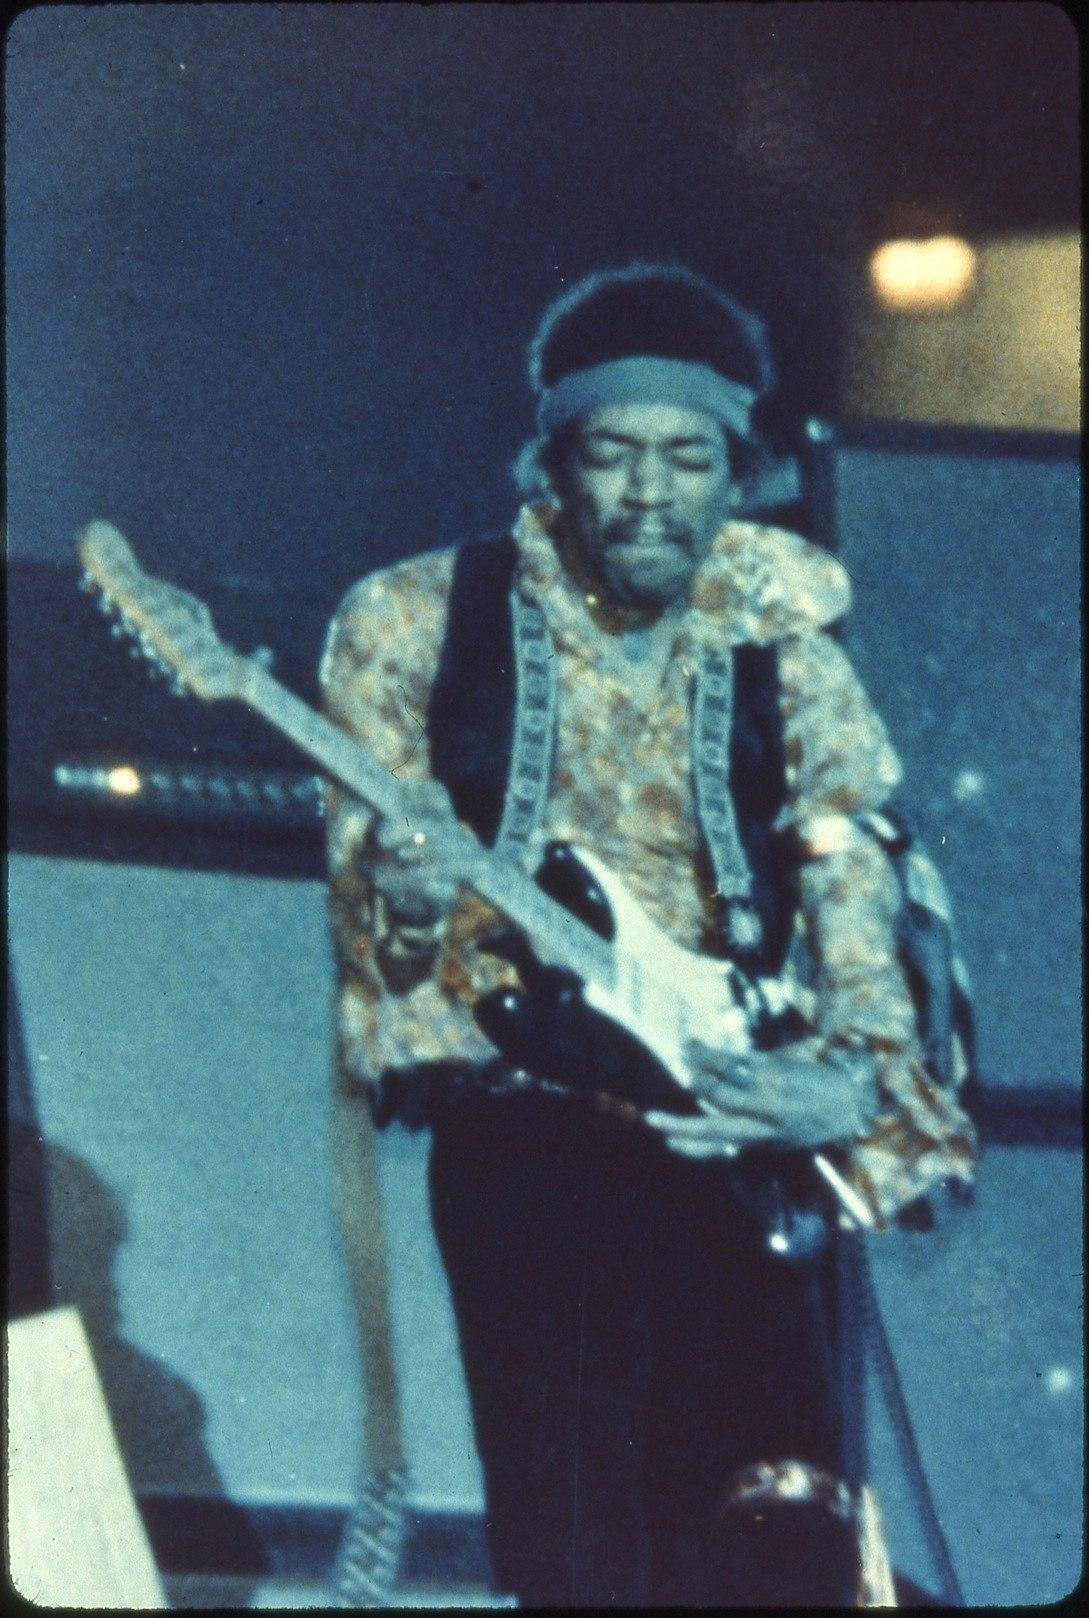 Philadelphie (Spectrum) : 12 avril 1969 C6b748403bd638098644d445cf619906